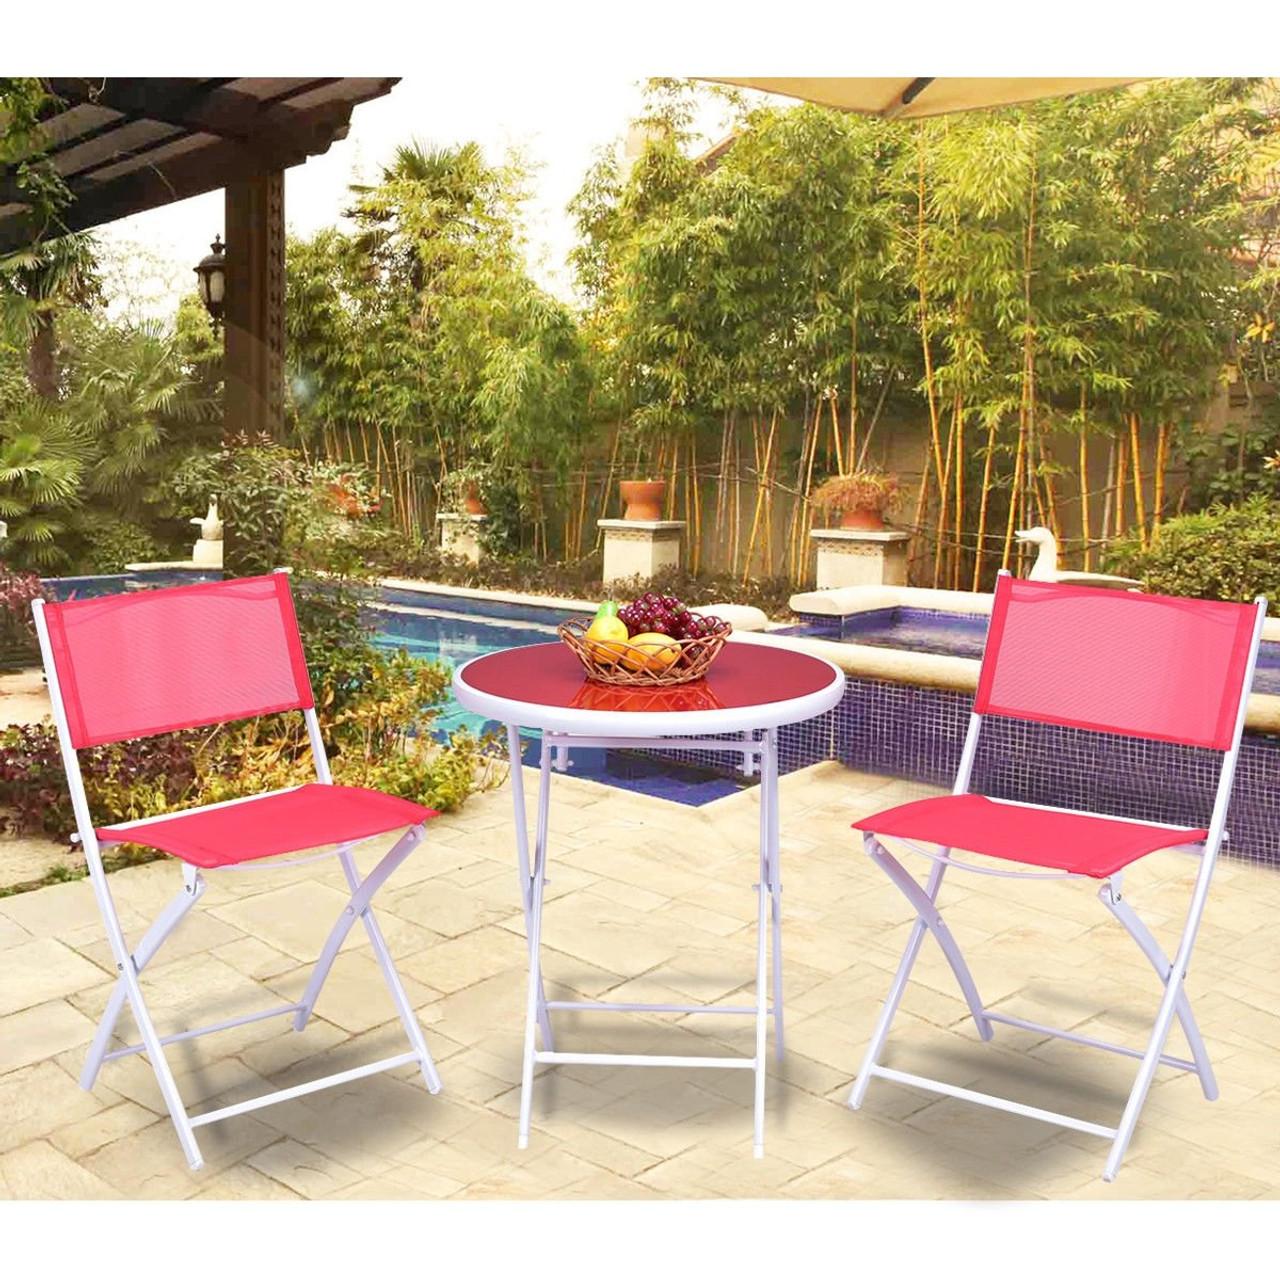 3 pcs folding bistro table chairs set garden backyard patio furniture black new red op3355re